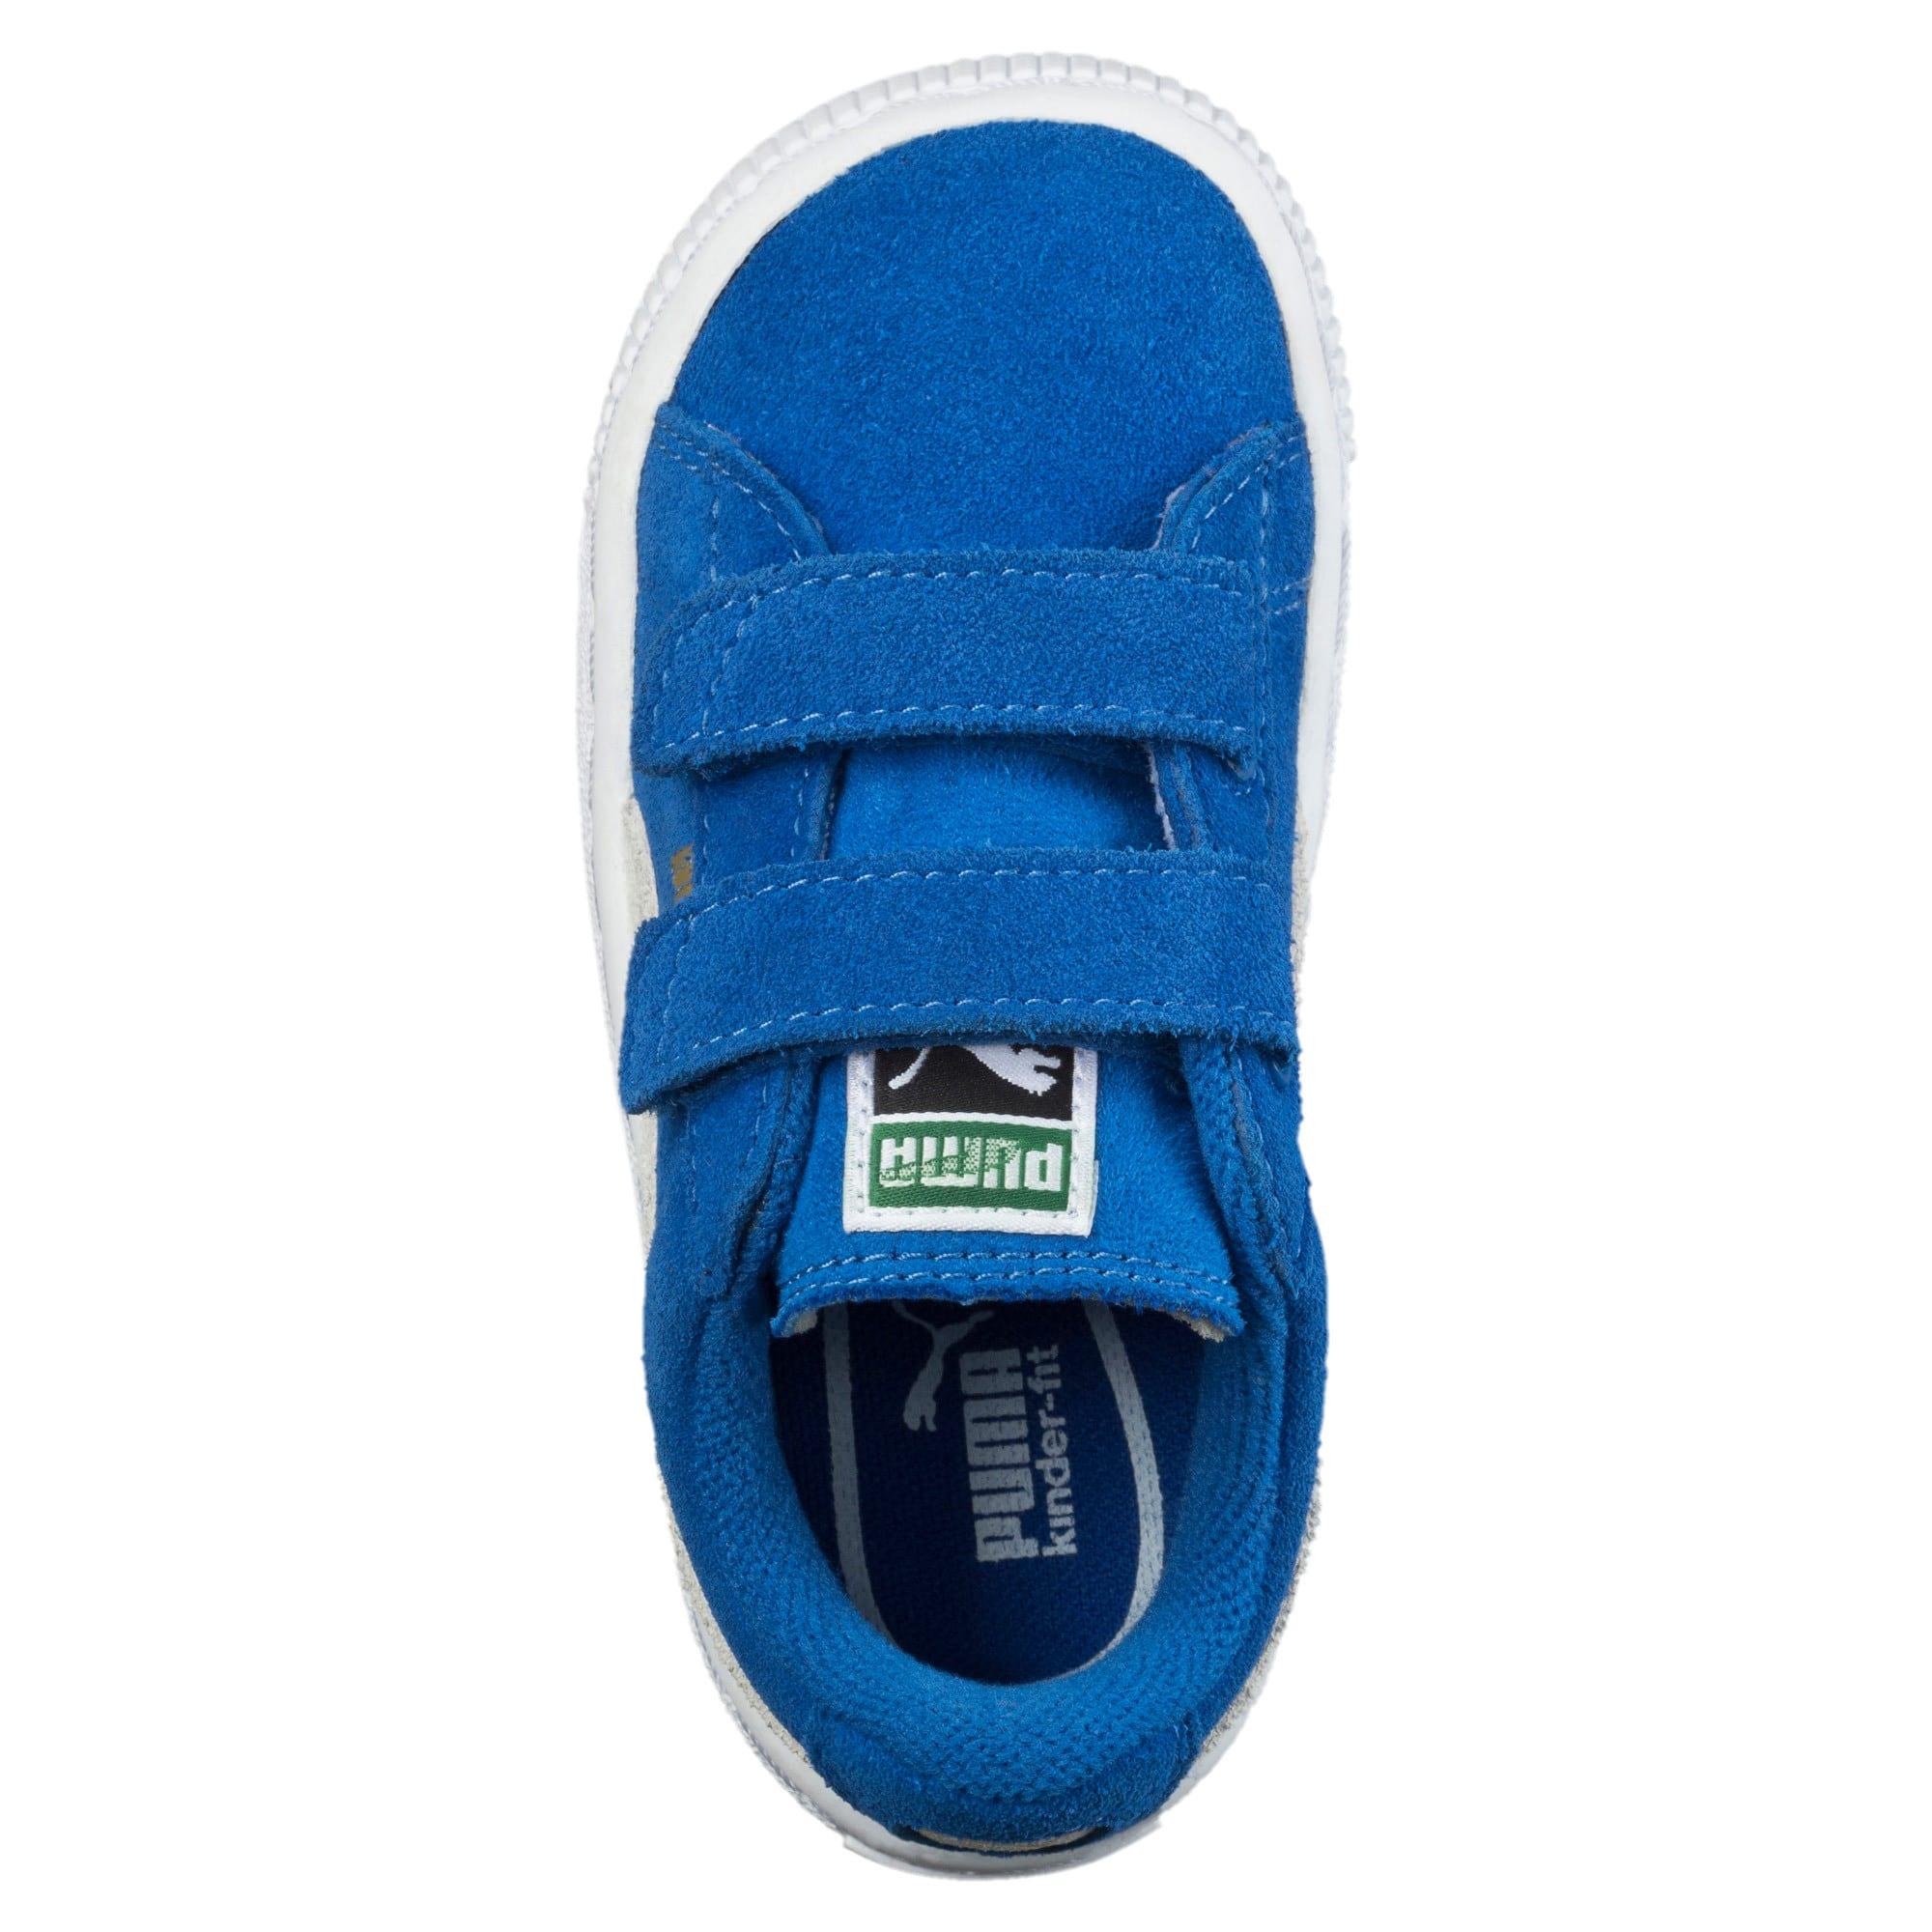 Thumbnail 5 of Suede Preschool Sneaker mit 2 Riemen, Snorkel Blue-Puma White, medium